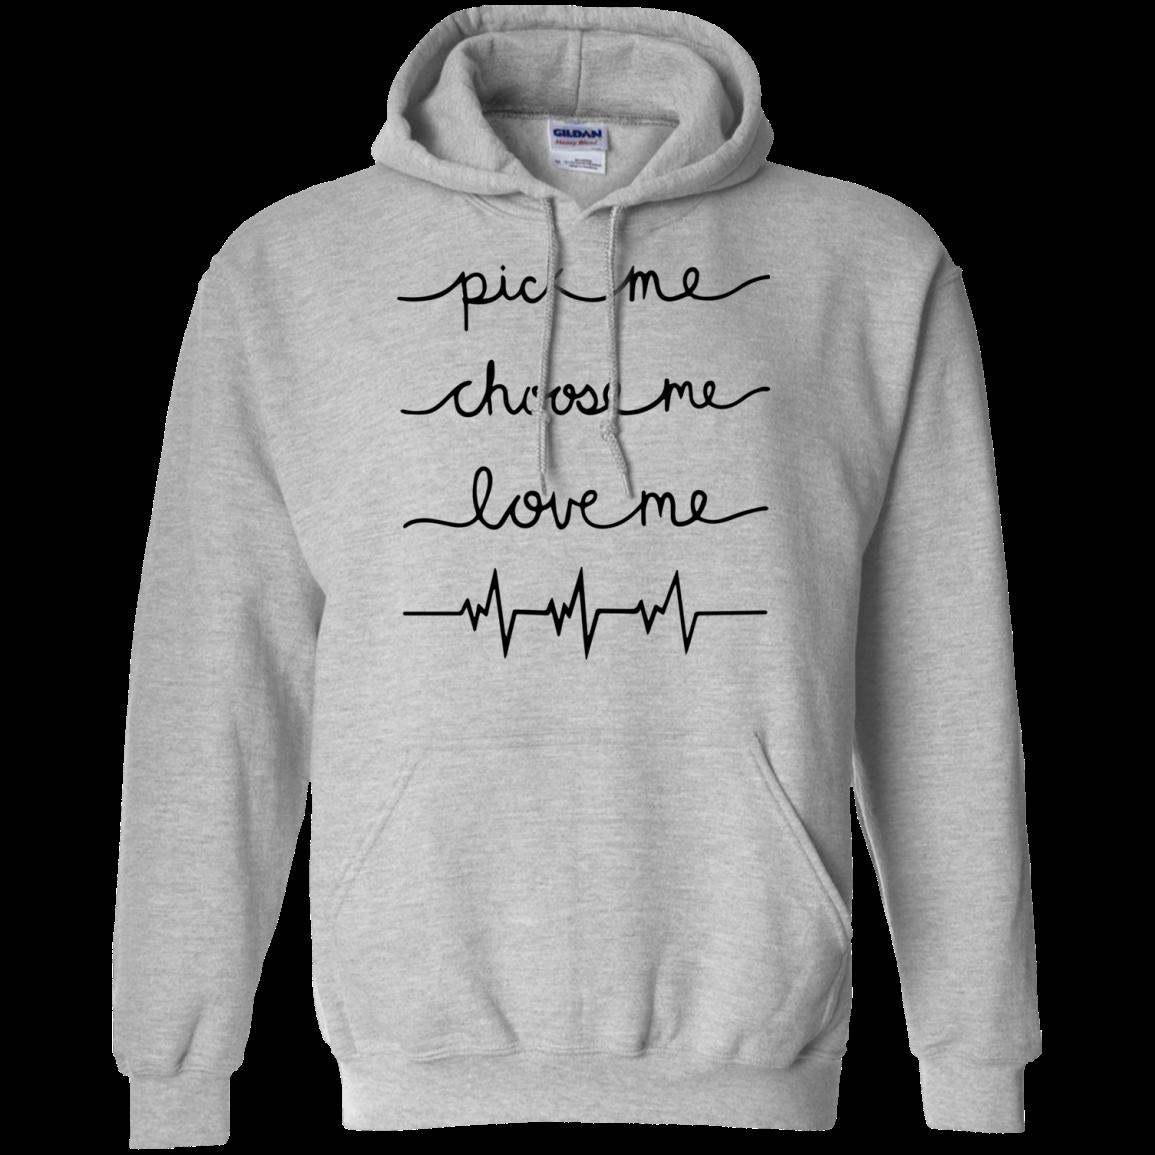 Grey's Anatomy - Pick me - Choose me - Love me Shirt ...